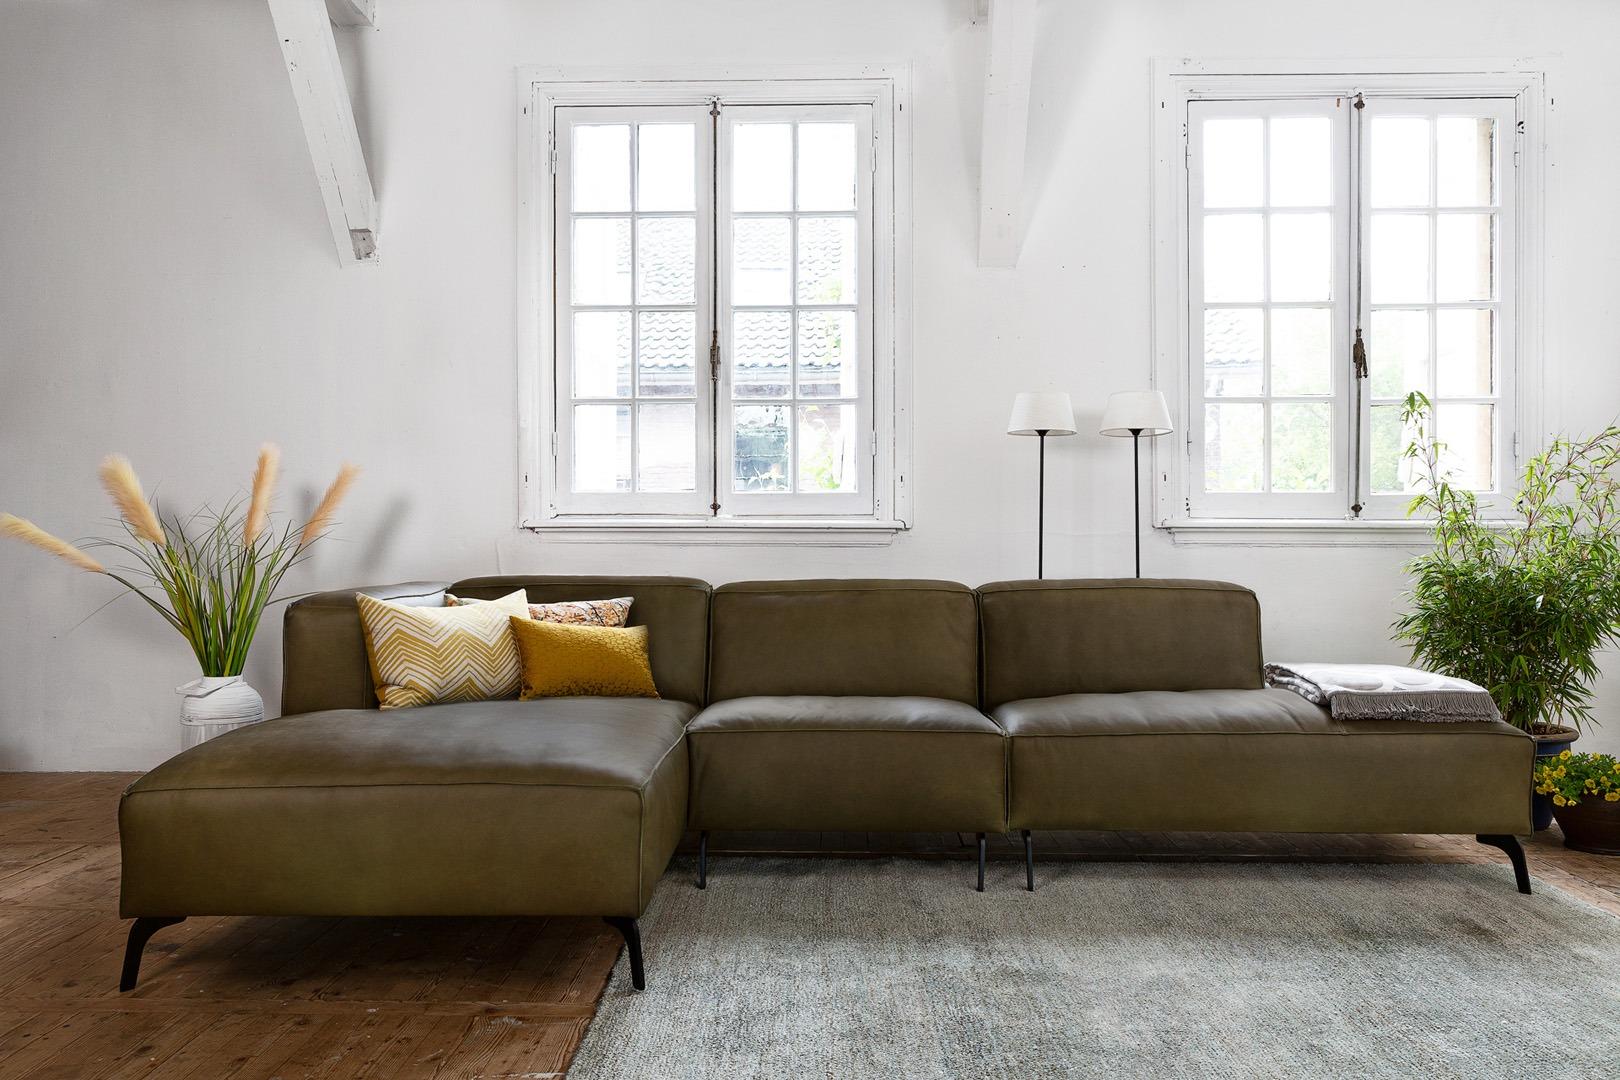 vino-piemonte-leer-groen-ottoman-terminal-longchair-soofs-interieur.